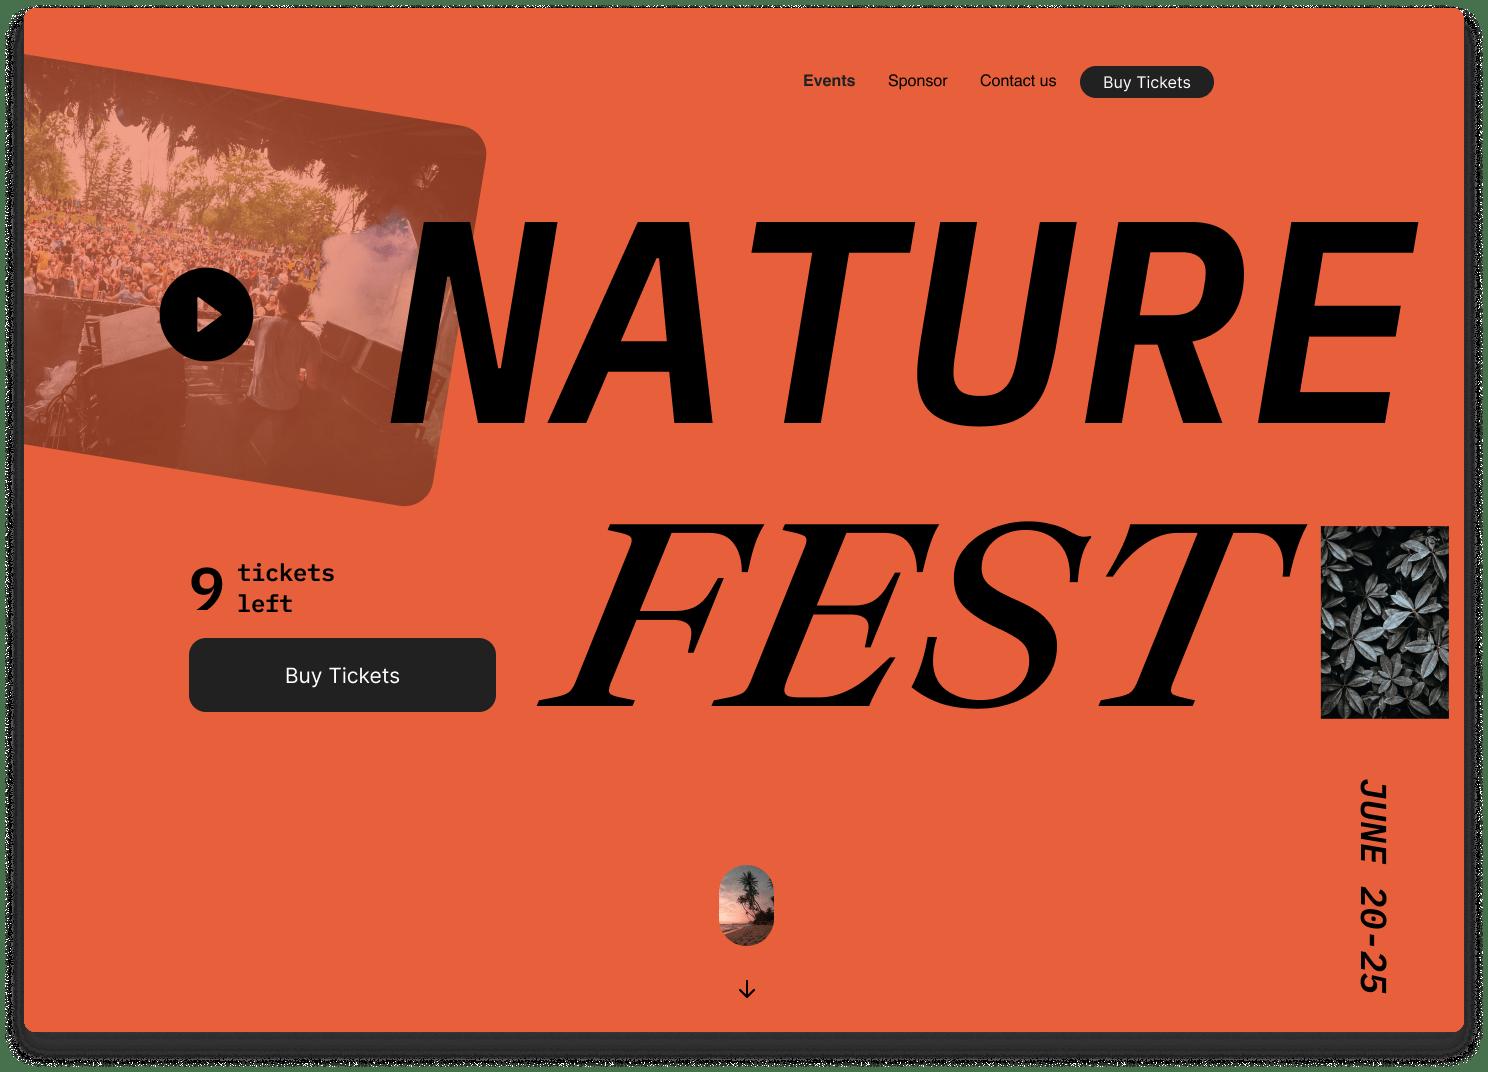 Nature fest website landing page